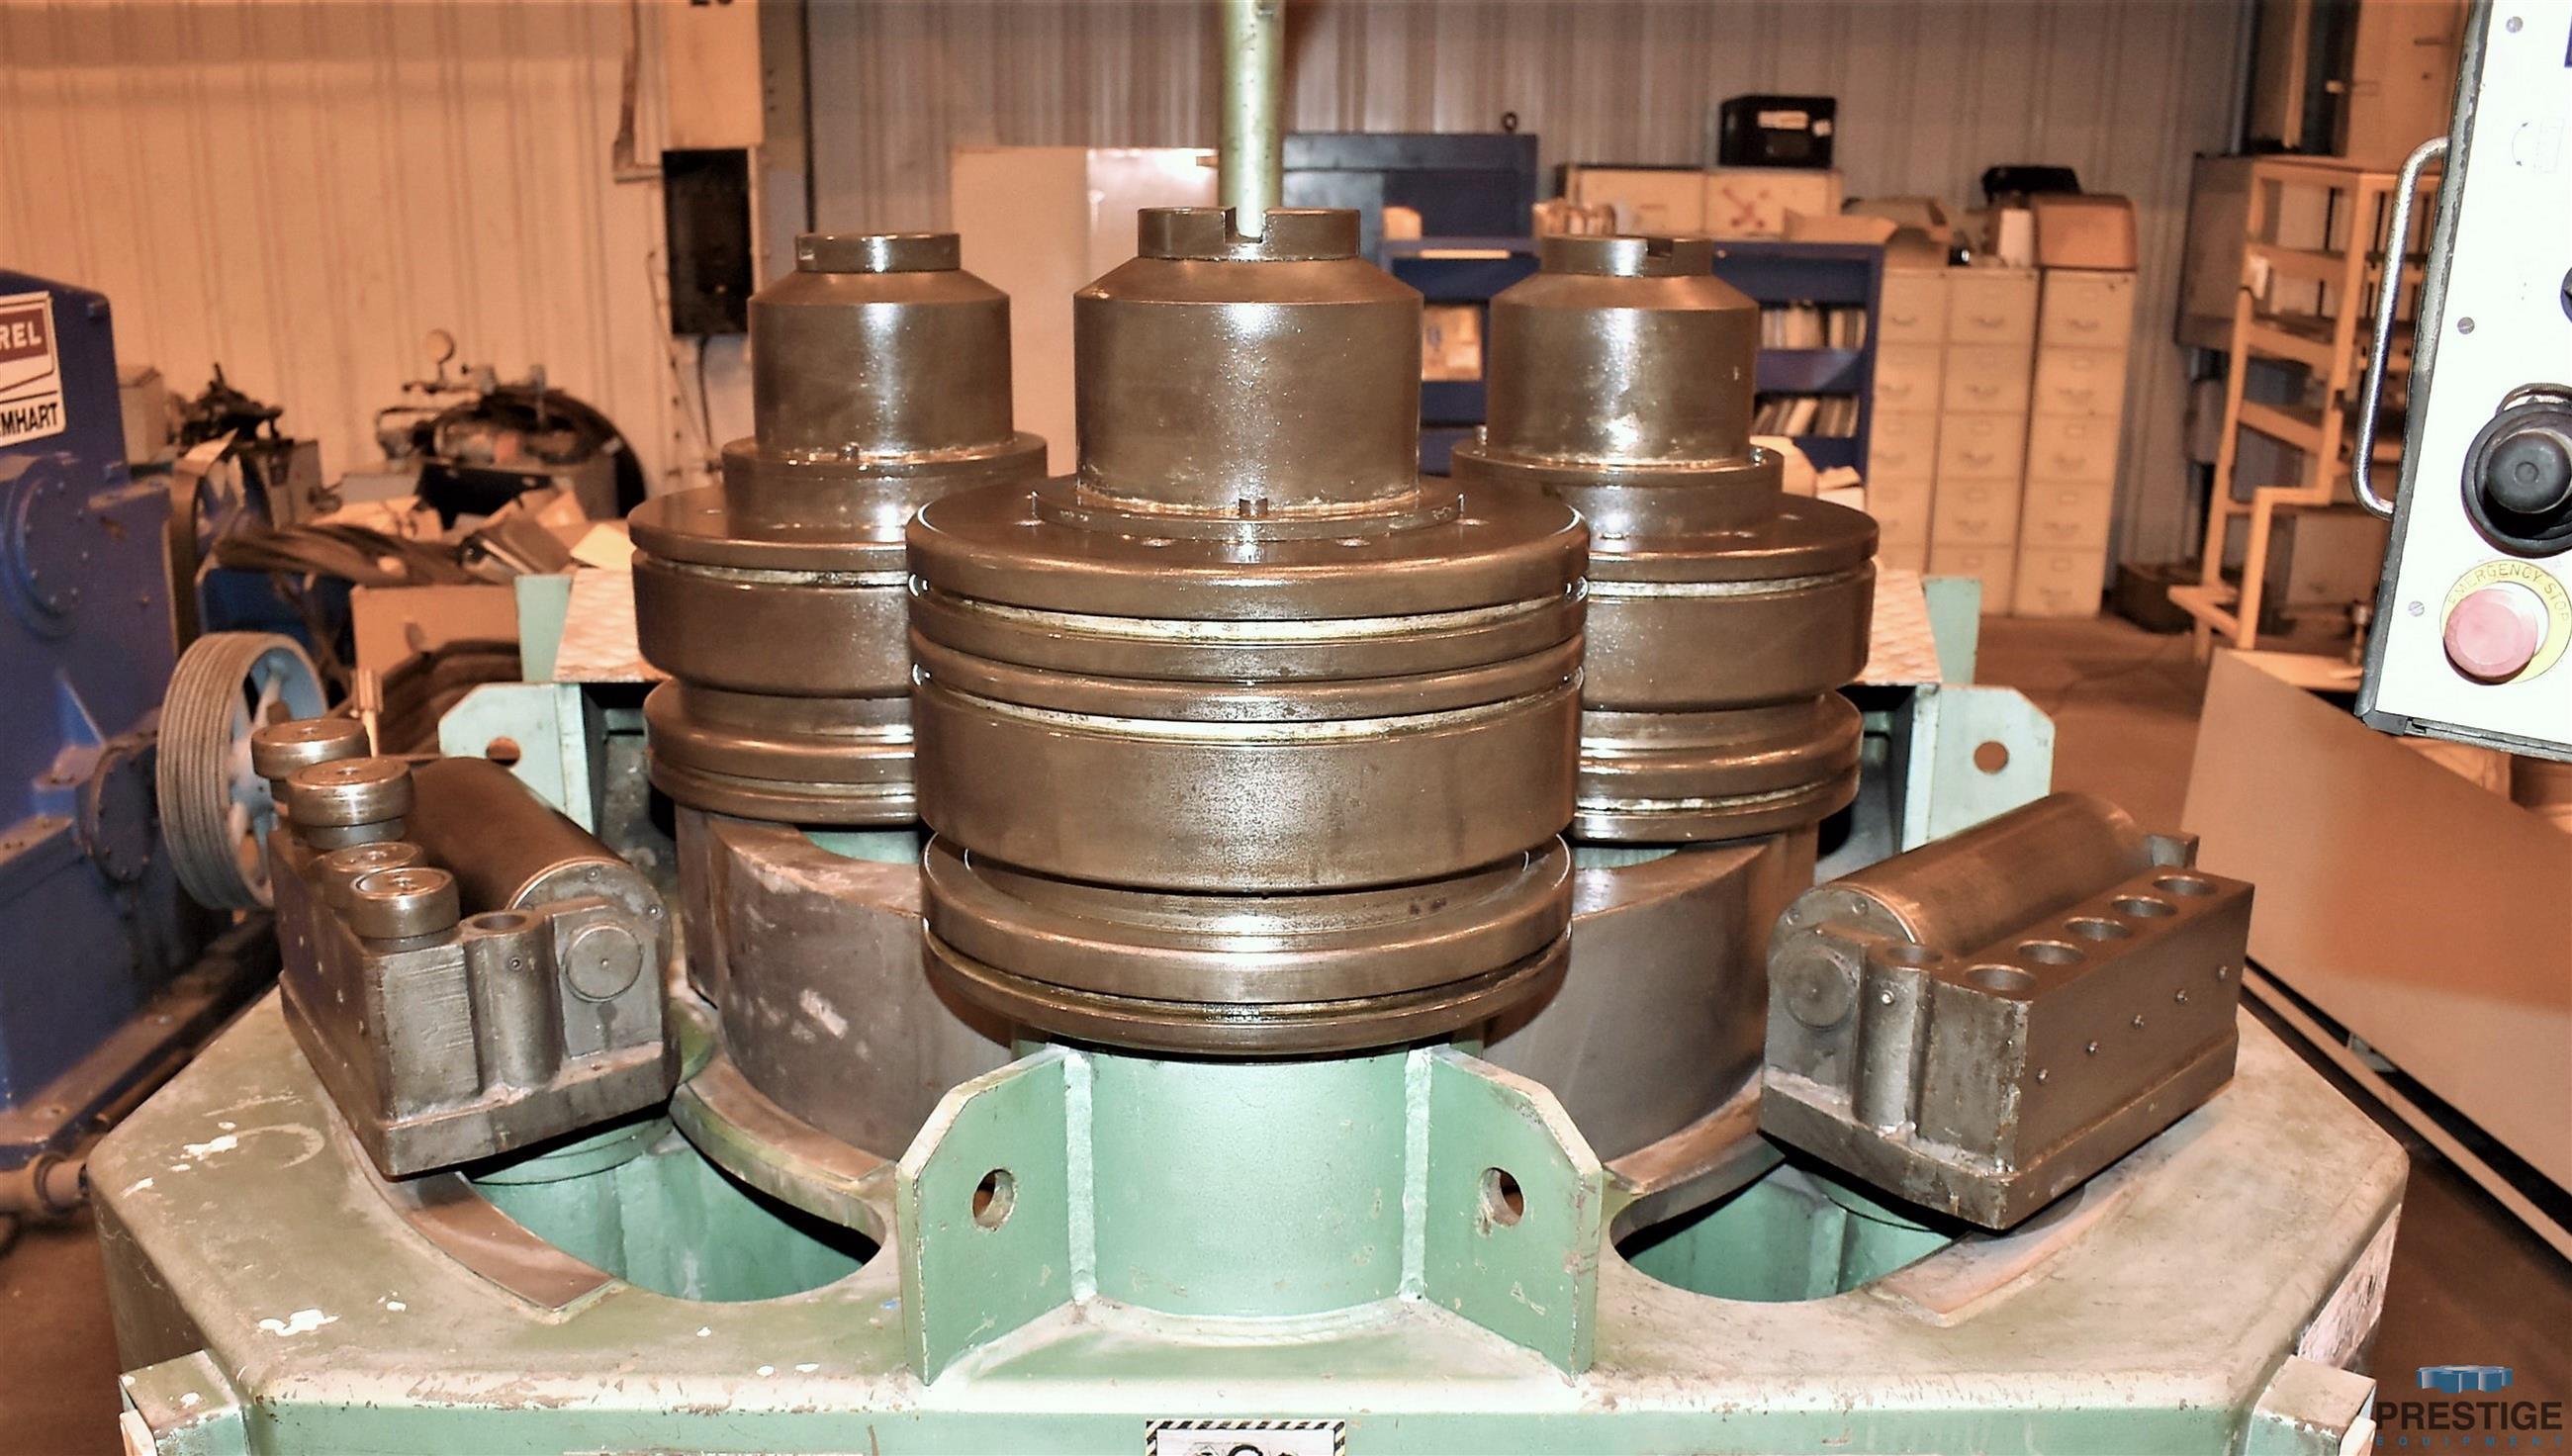 Roundo R6S 152 MM  x 152 MM  x 16 MM  Horizontal Angle Bending Roll-31504b